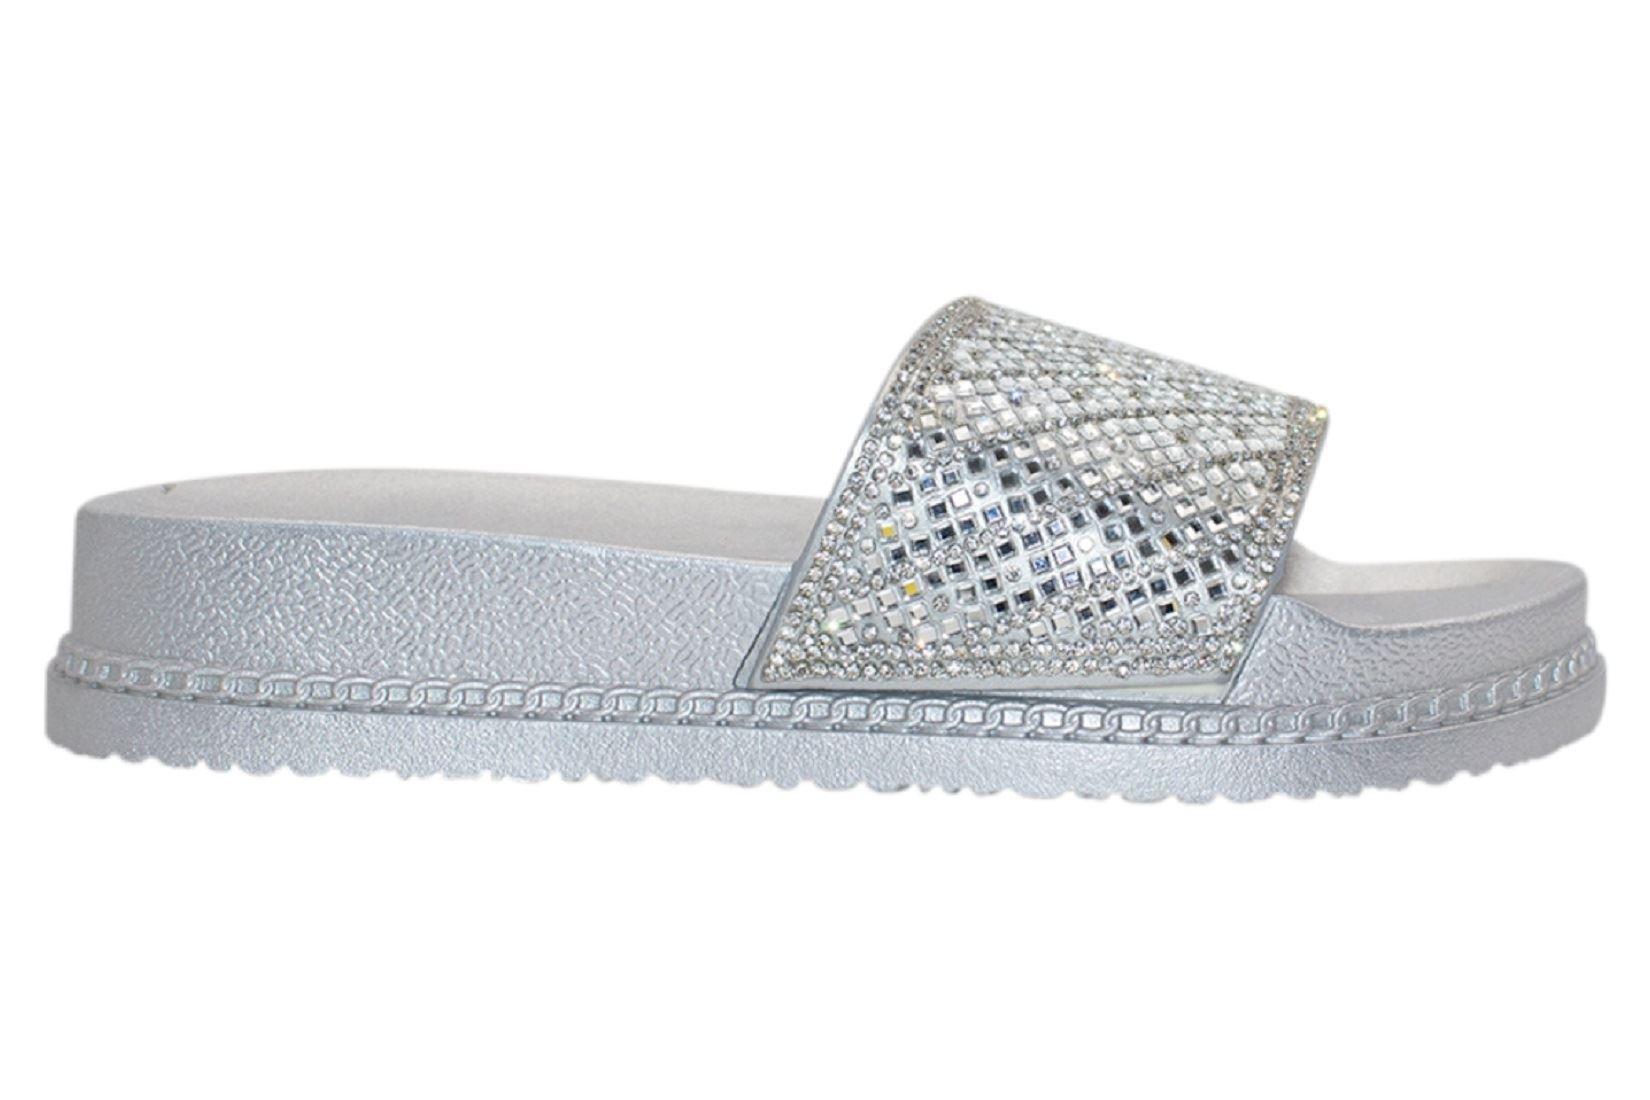 Womens-Sliders-Casual-Slippers-Mules-Ladies-Diamante-Flip-Flop-Sandals-Shoes thumbnail 57